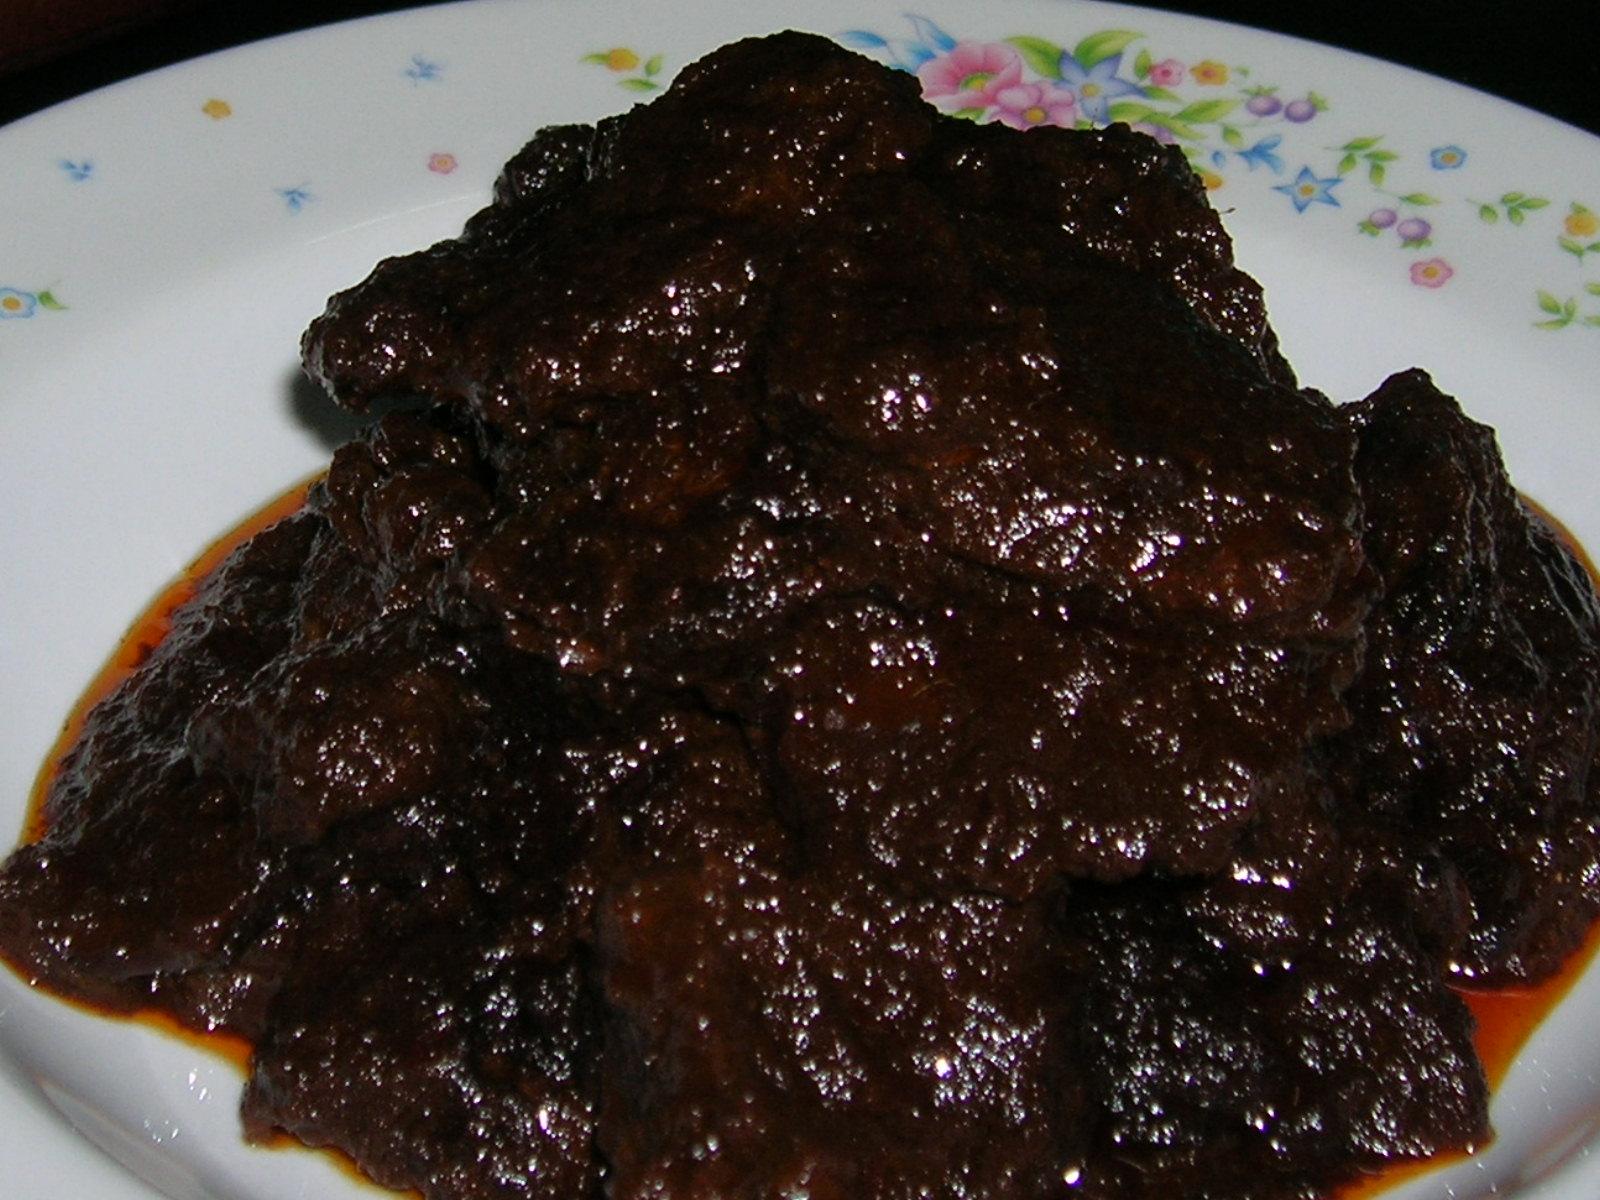 resepi daging masak hitam kering crv tu Resepi Ayam Masak Halia Lada Hitam Enak dan Mudah